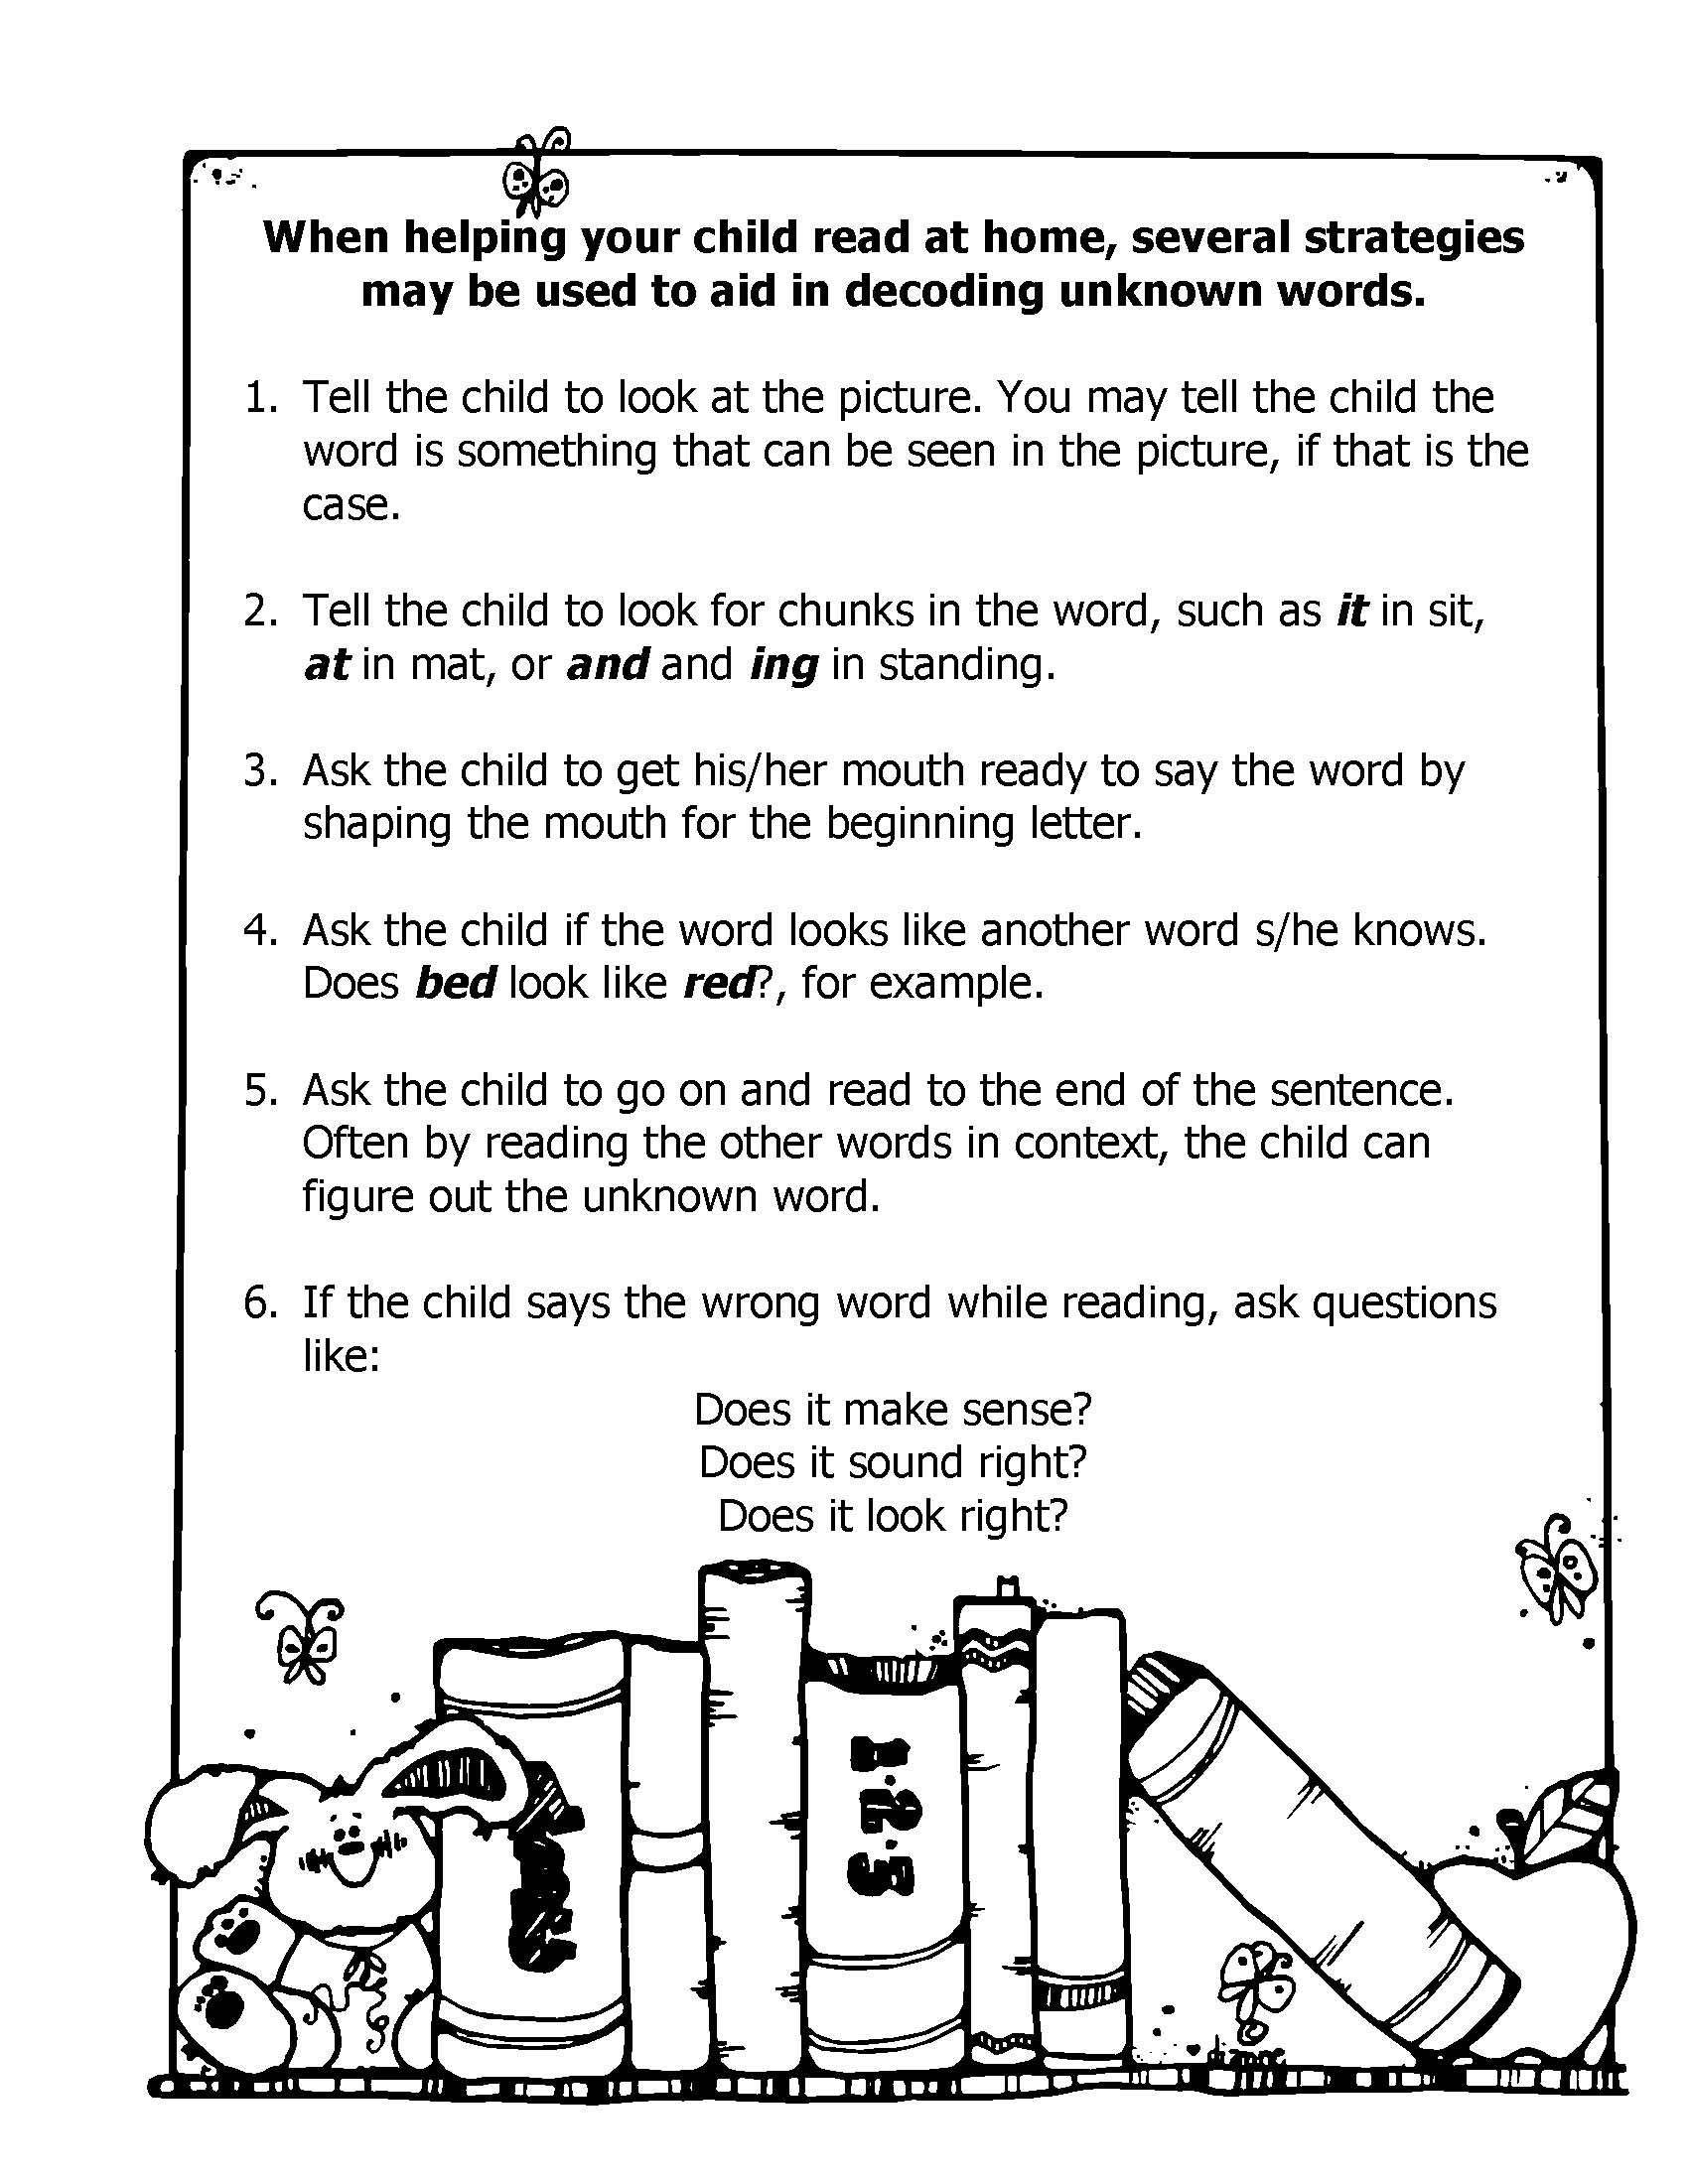 Homework strategies for parents